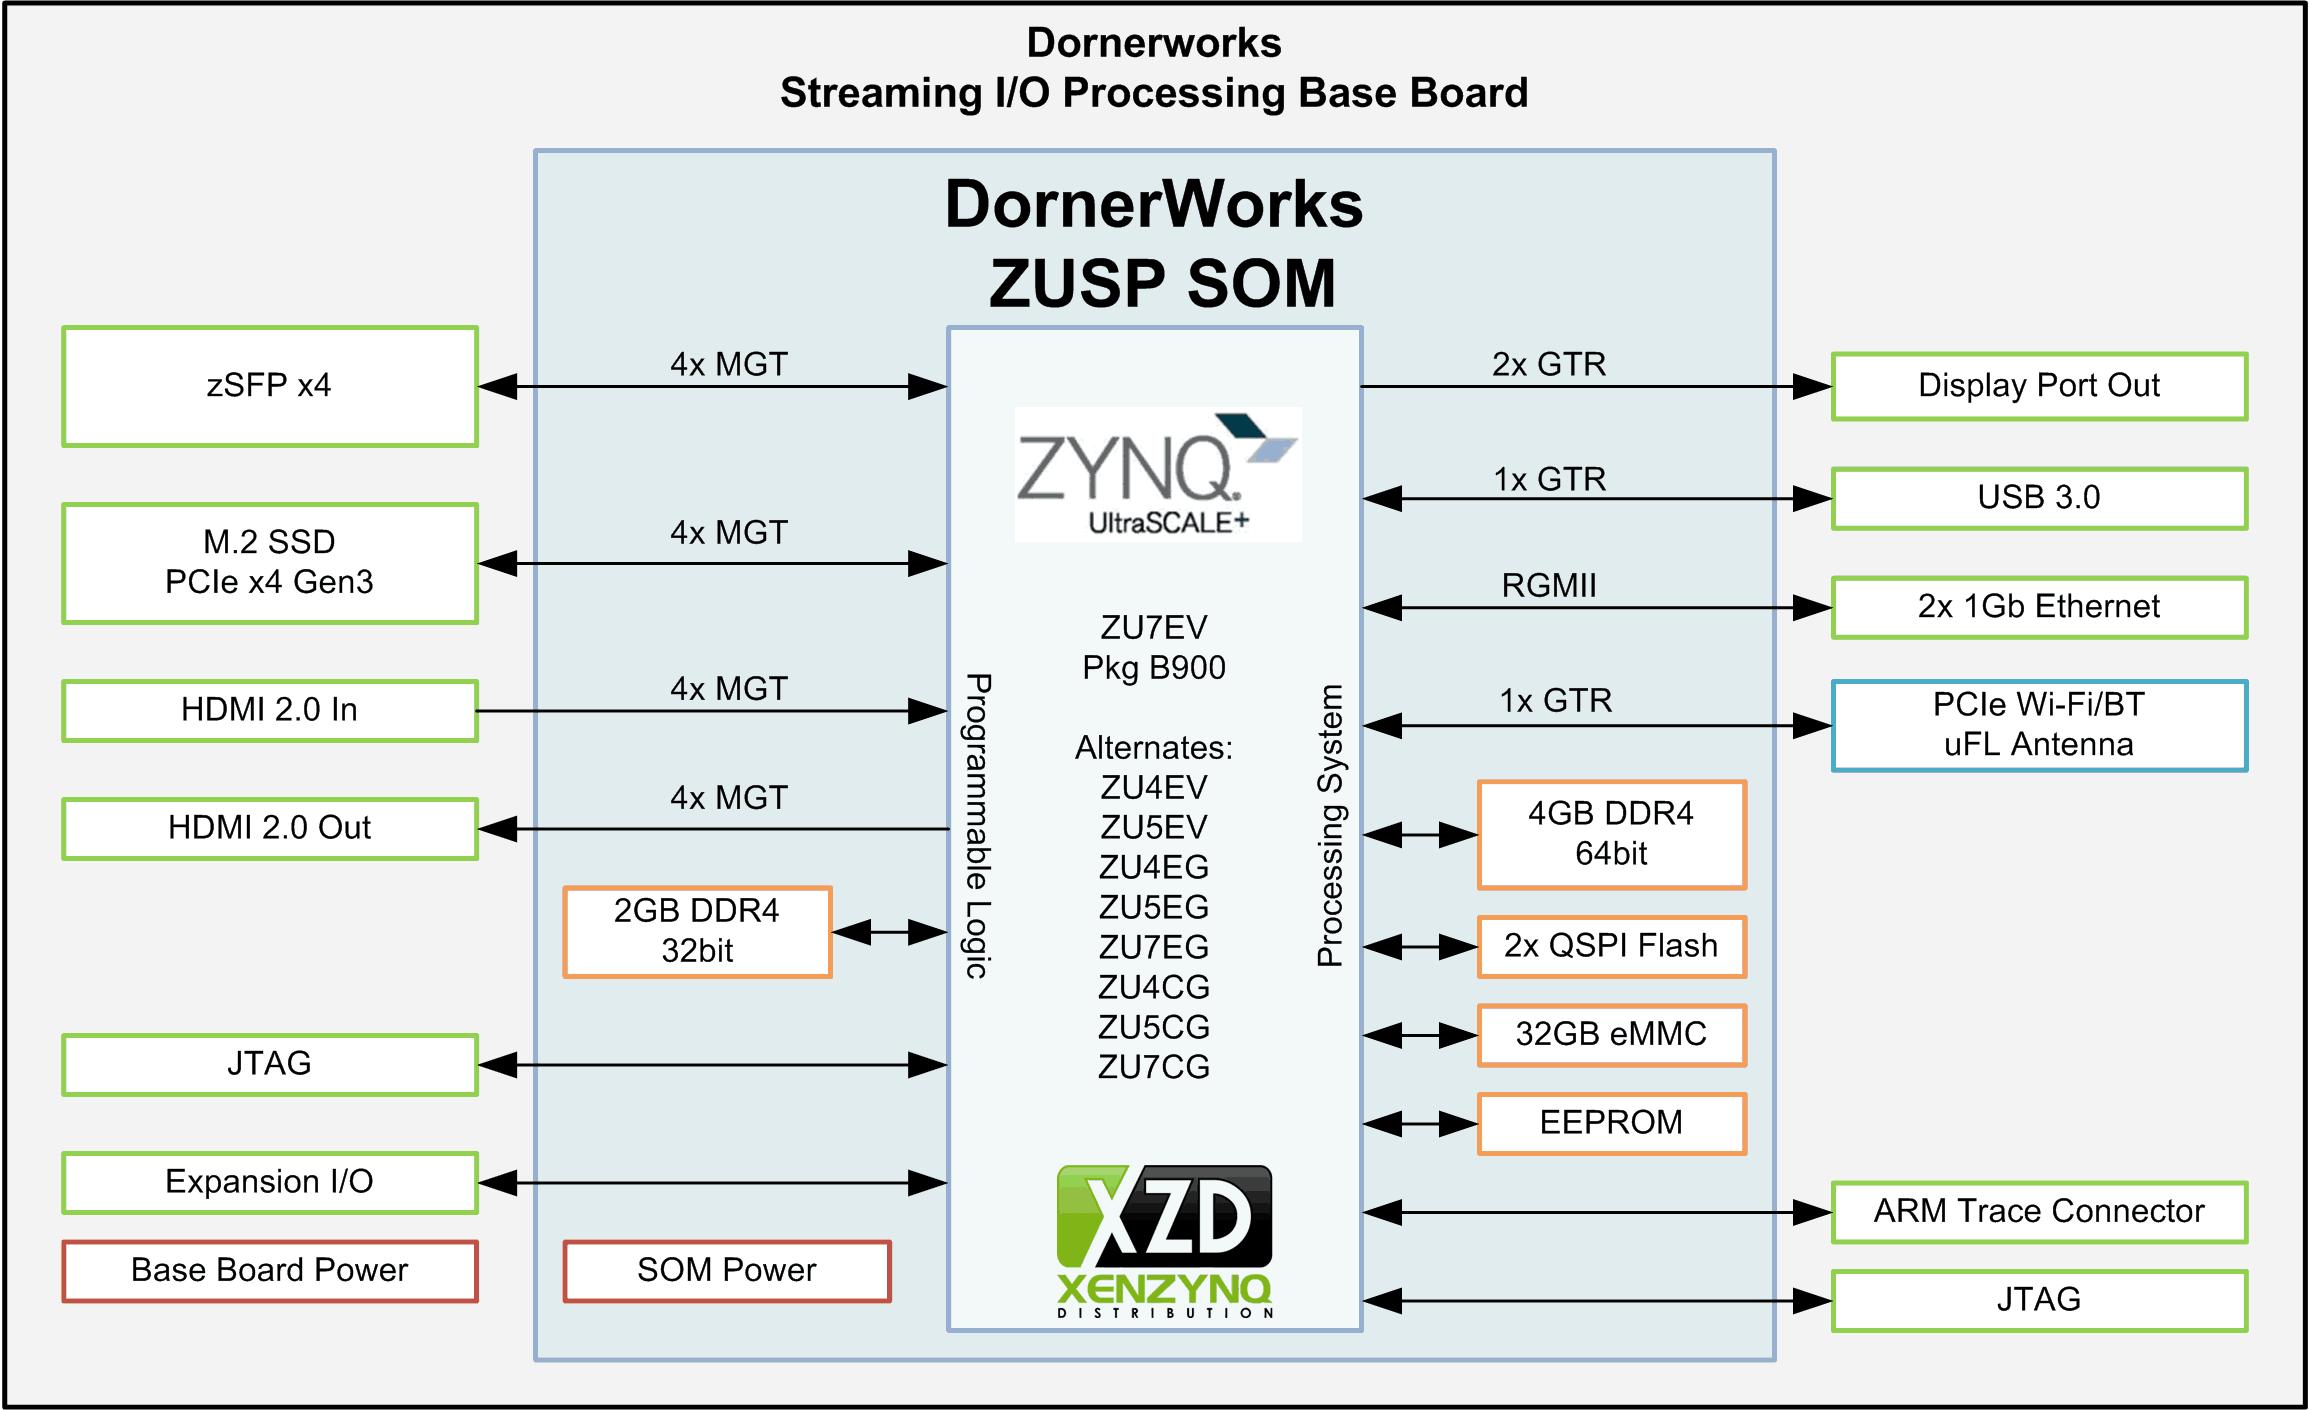 Som For Zynq Ultrascale Dornerworks H 265 Block Diagram Streaming I O Platform